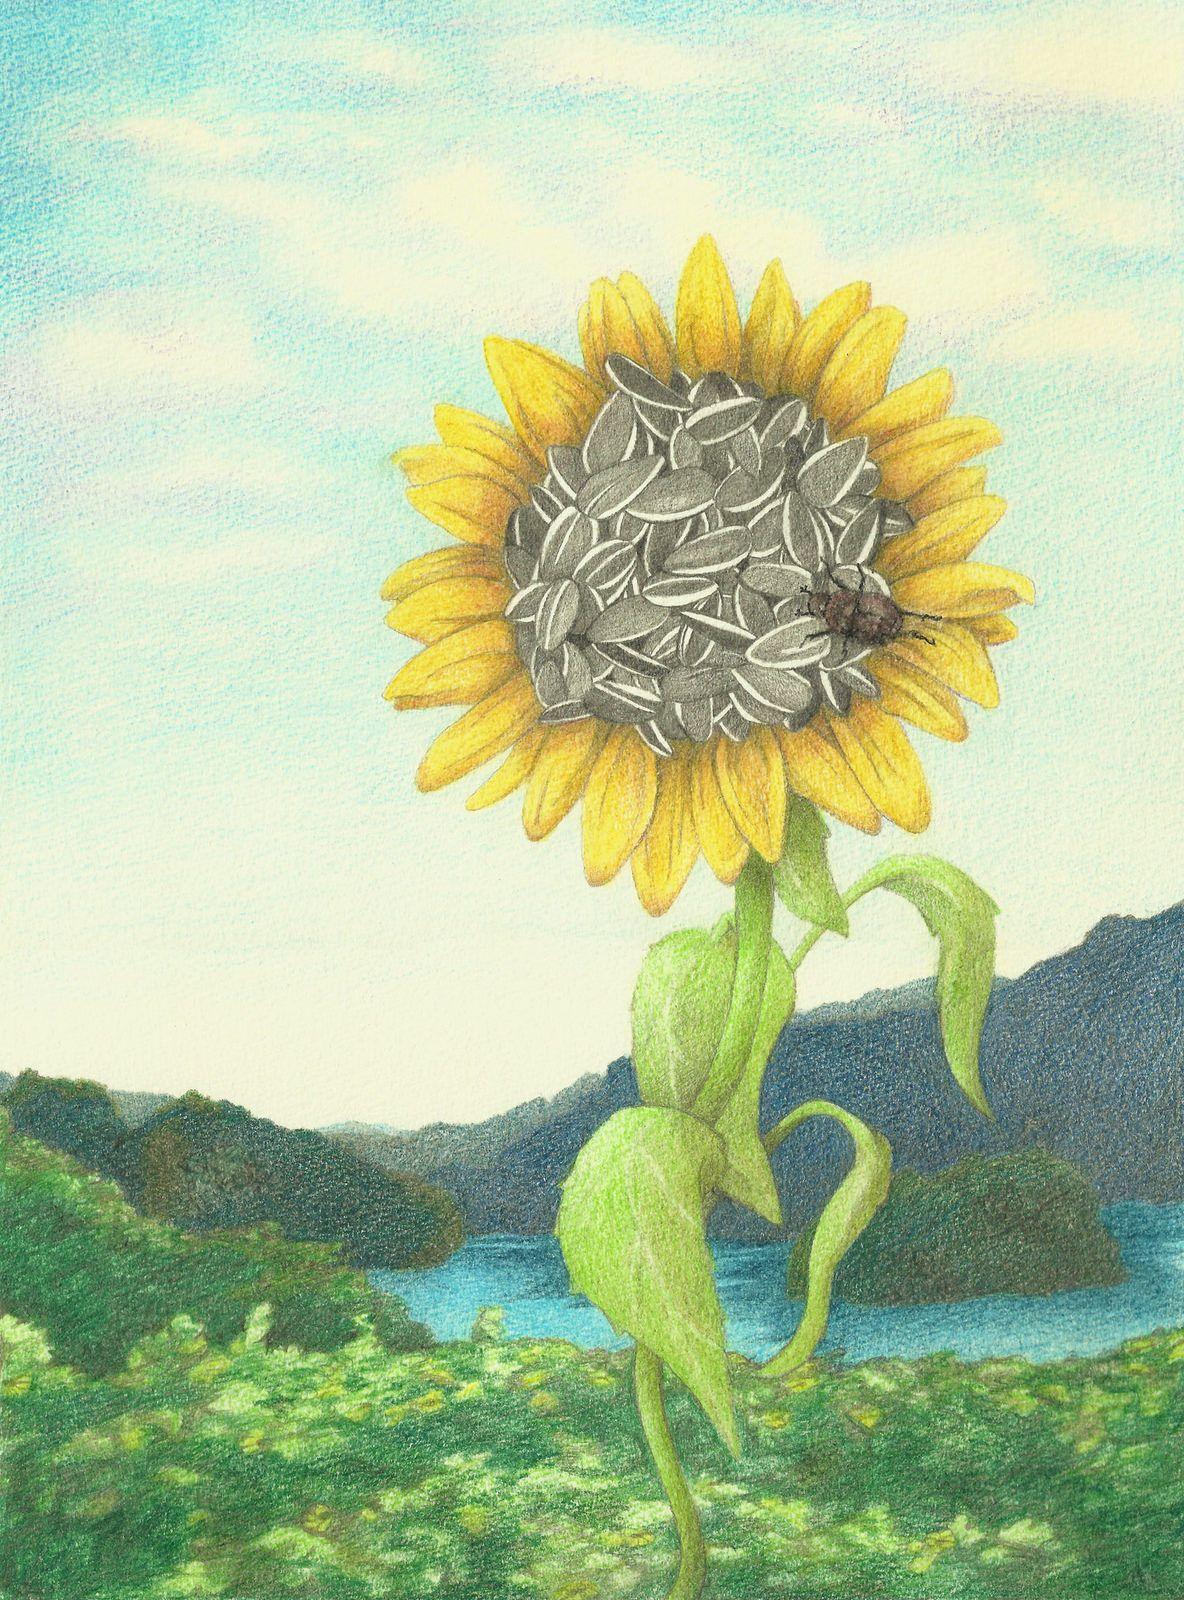 Helianthus annuus the common sunflower artist art